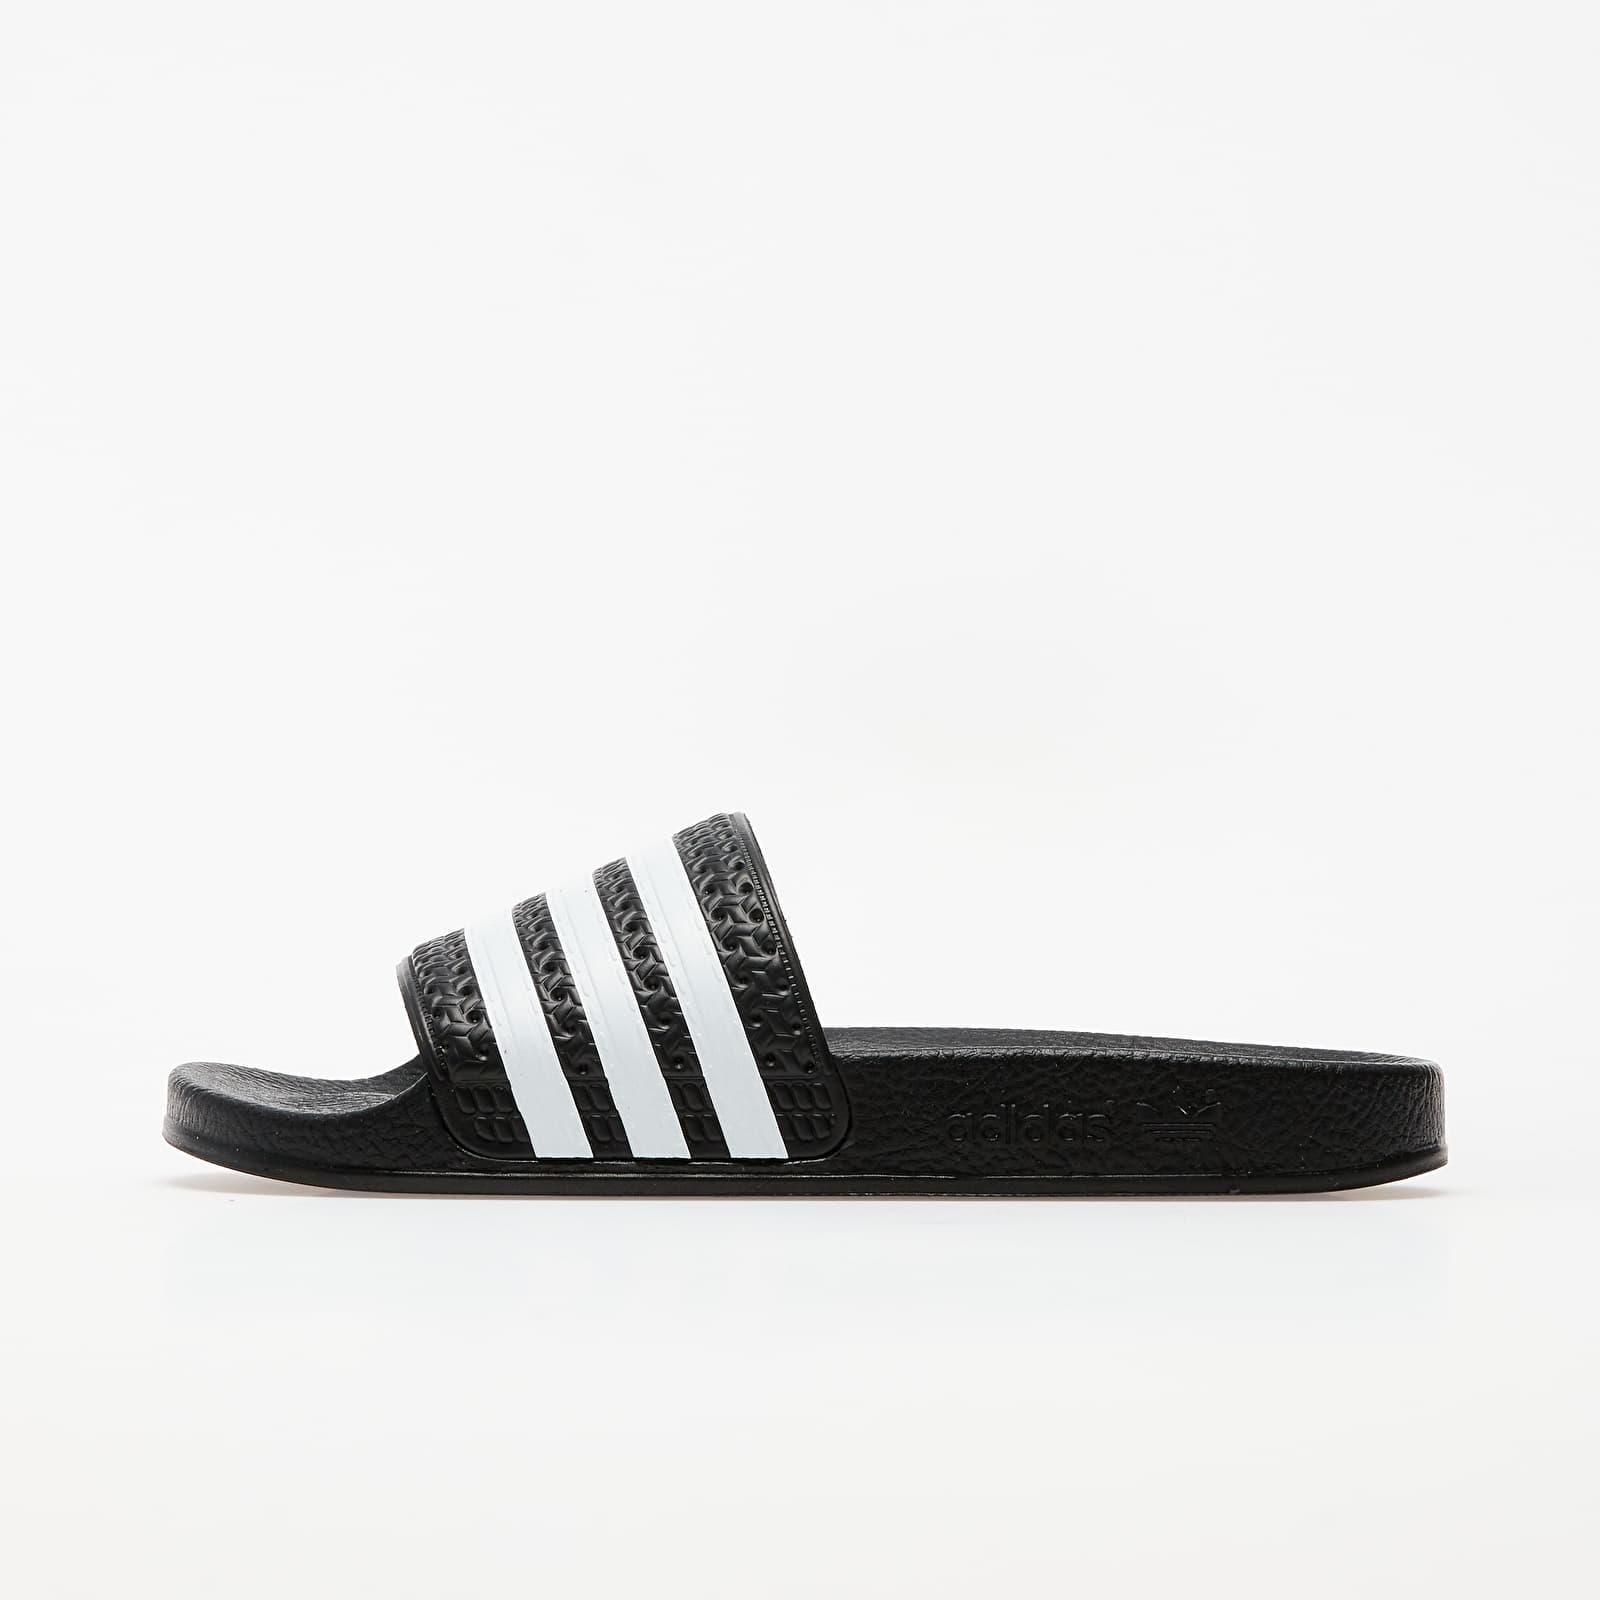 Chaussures et baskets homme adidas Adilette Black/ White/ Black